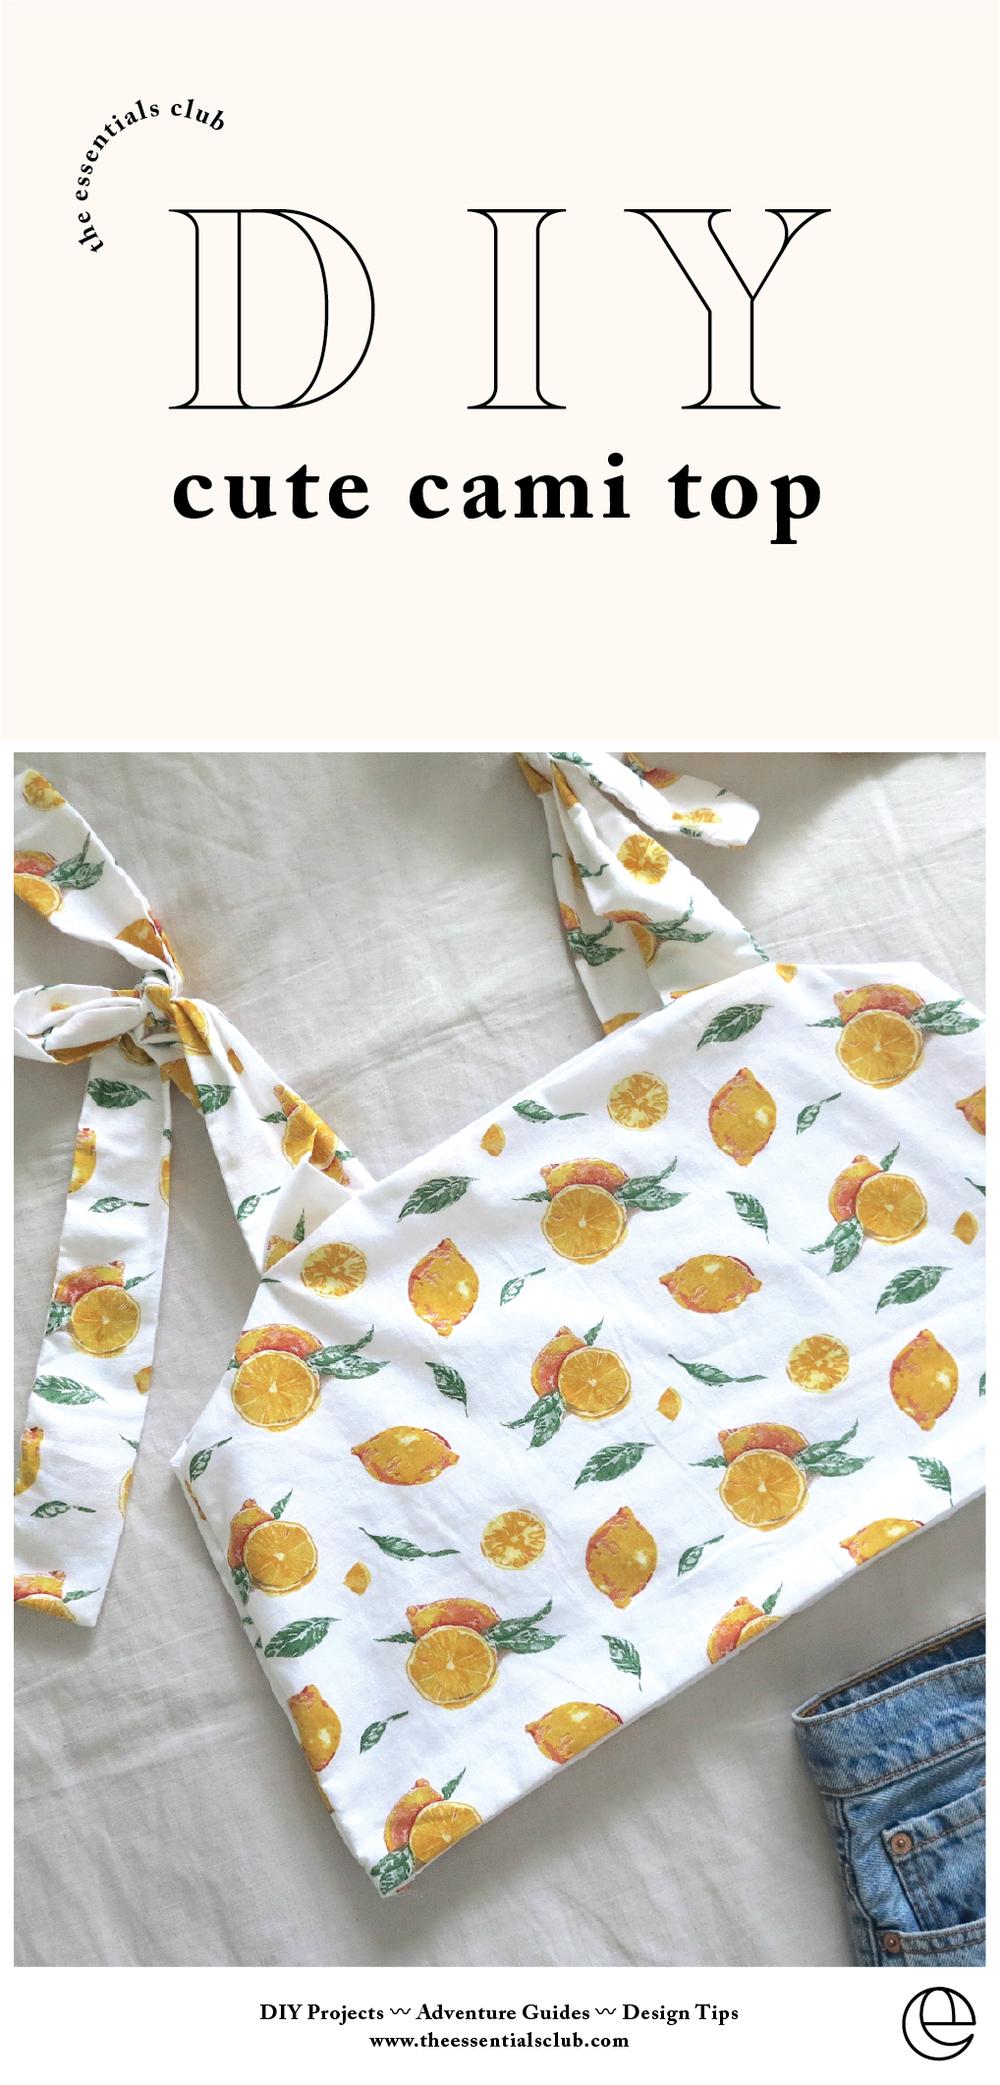 DIY: Cute Cami Top With Tie Sleeves — The Essentials Club // Creative DIY Hub